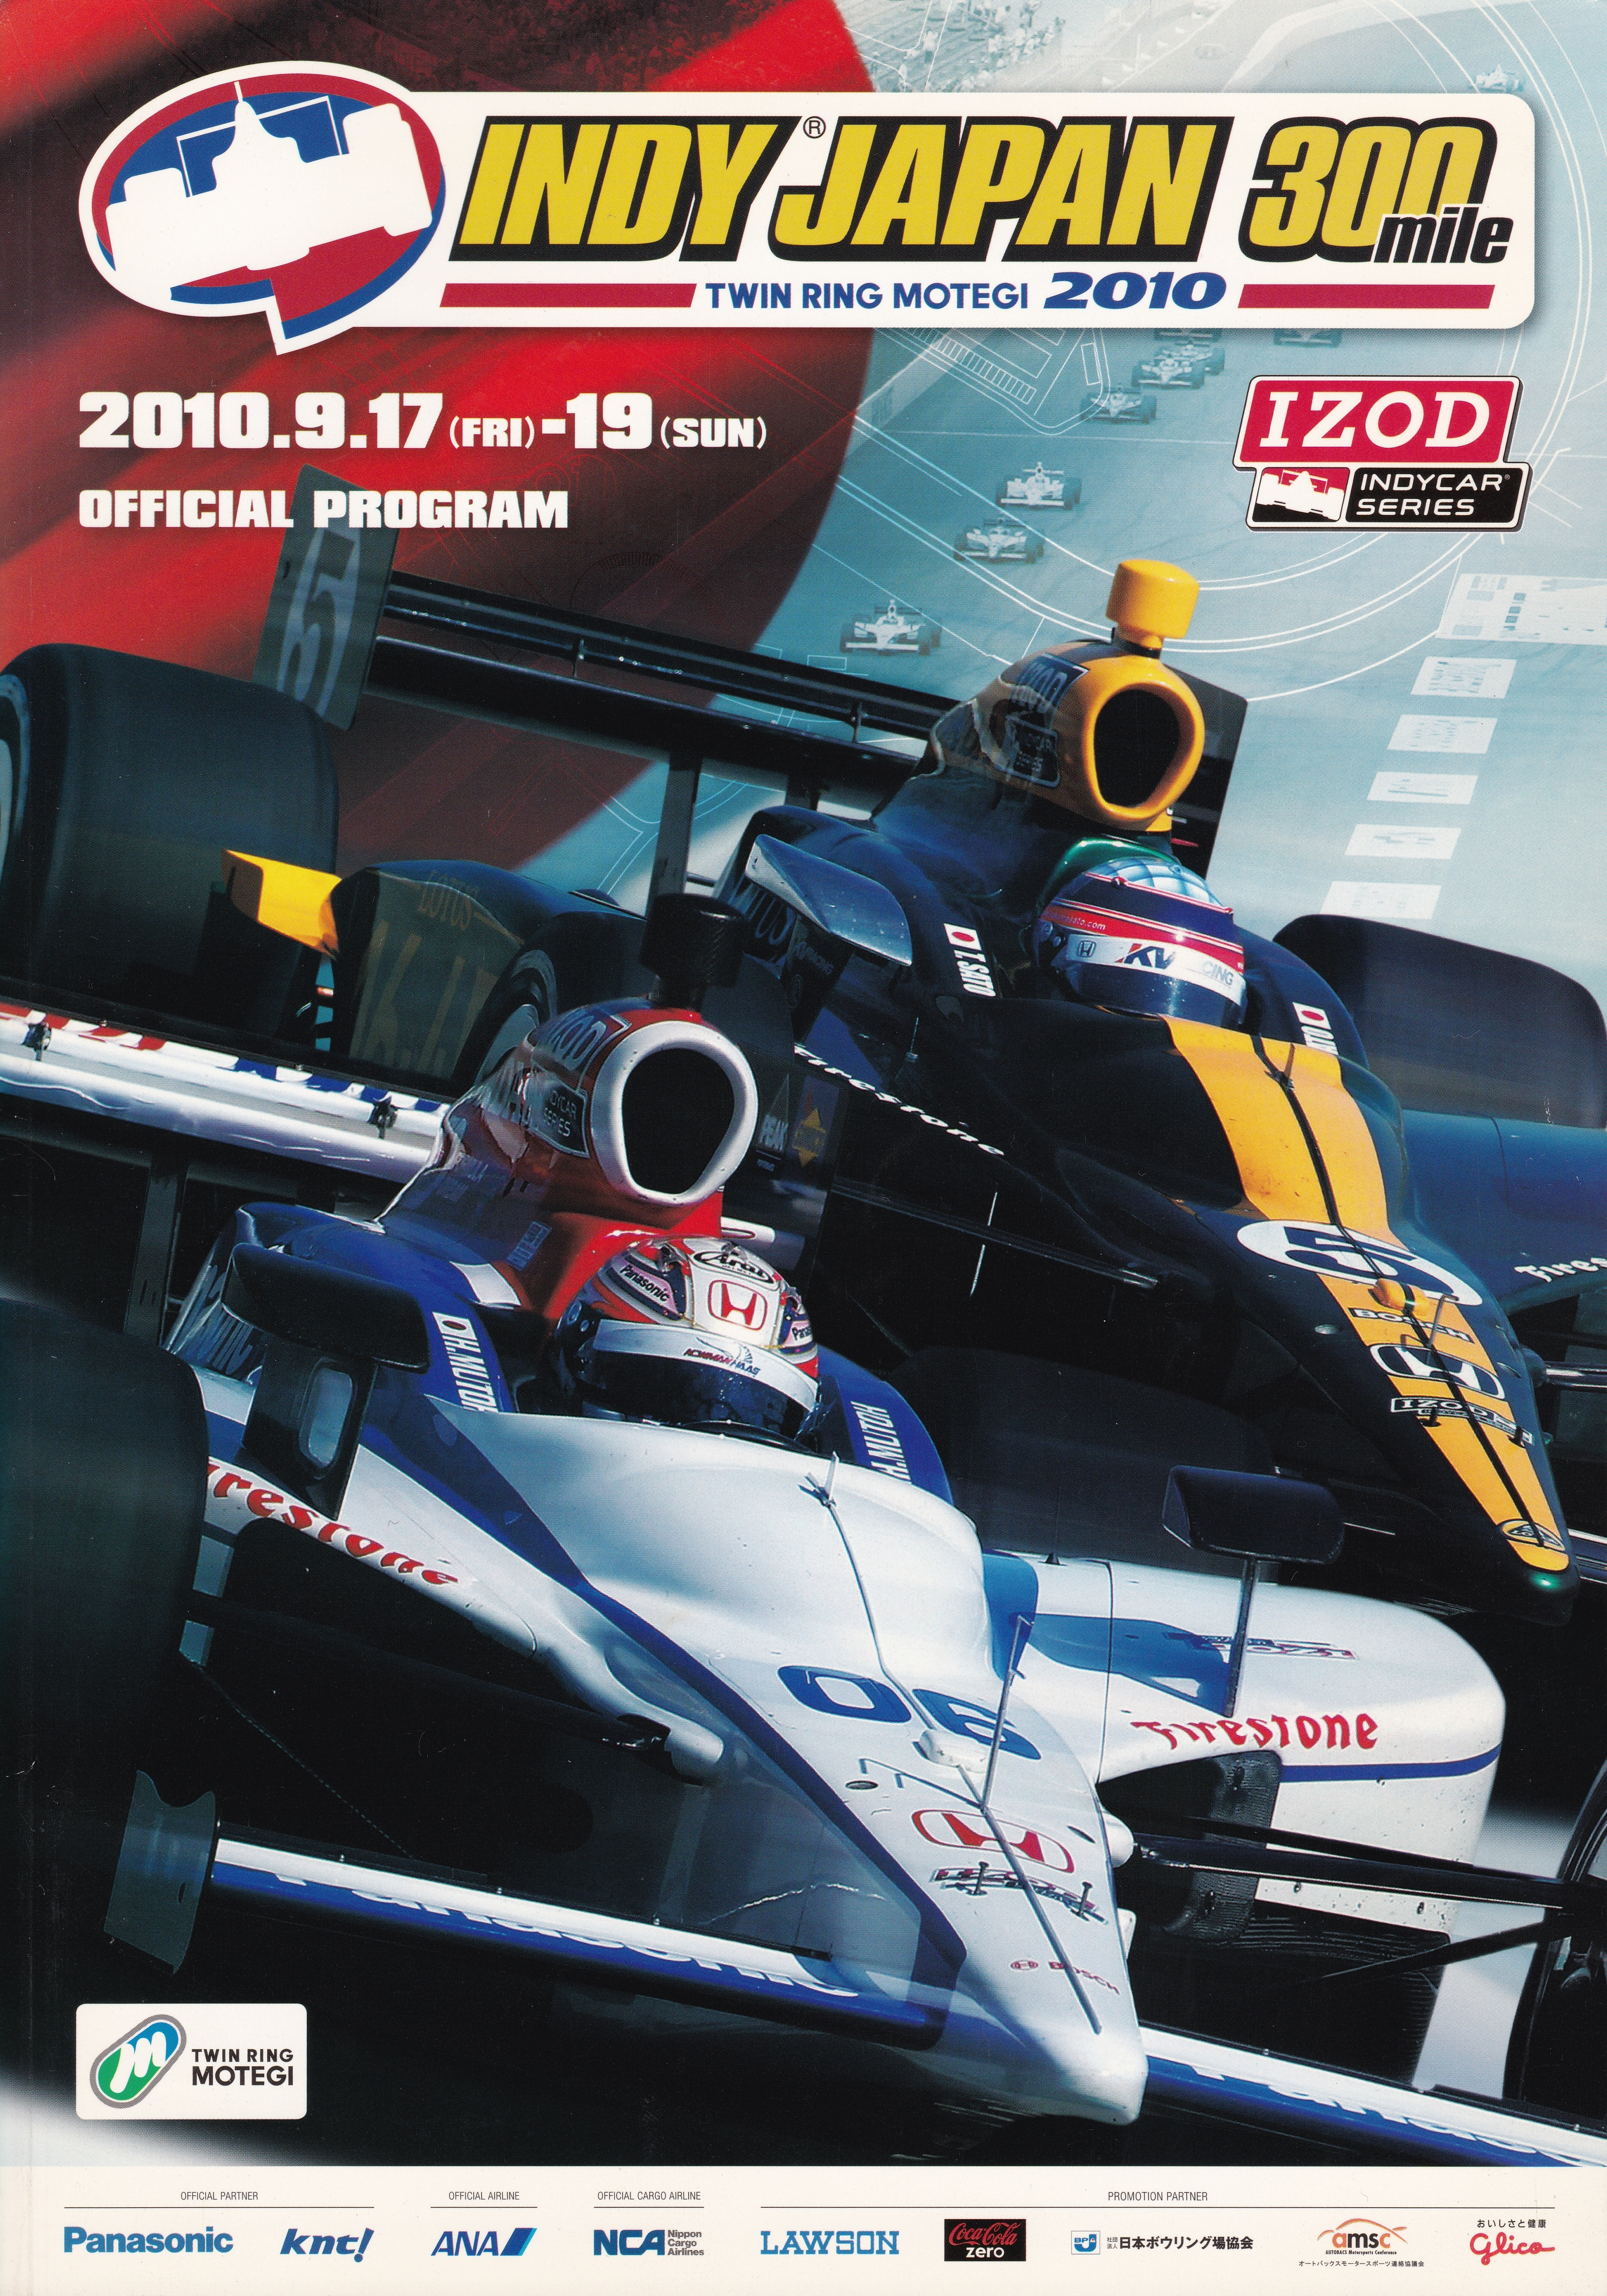 Mid Ohio Sportscar Course >> 2010 IndyCar Series Programmes | The Motor Racing ...